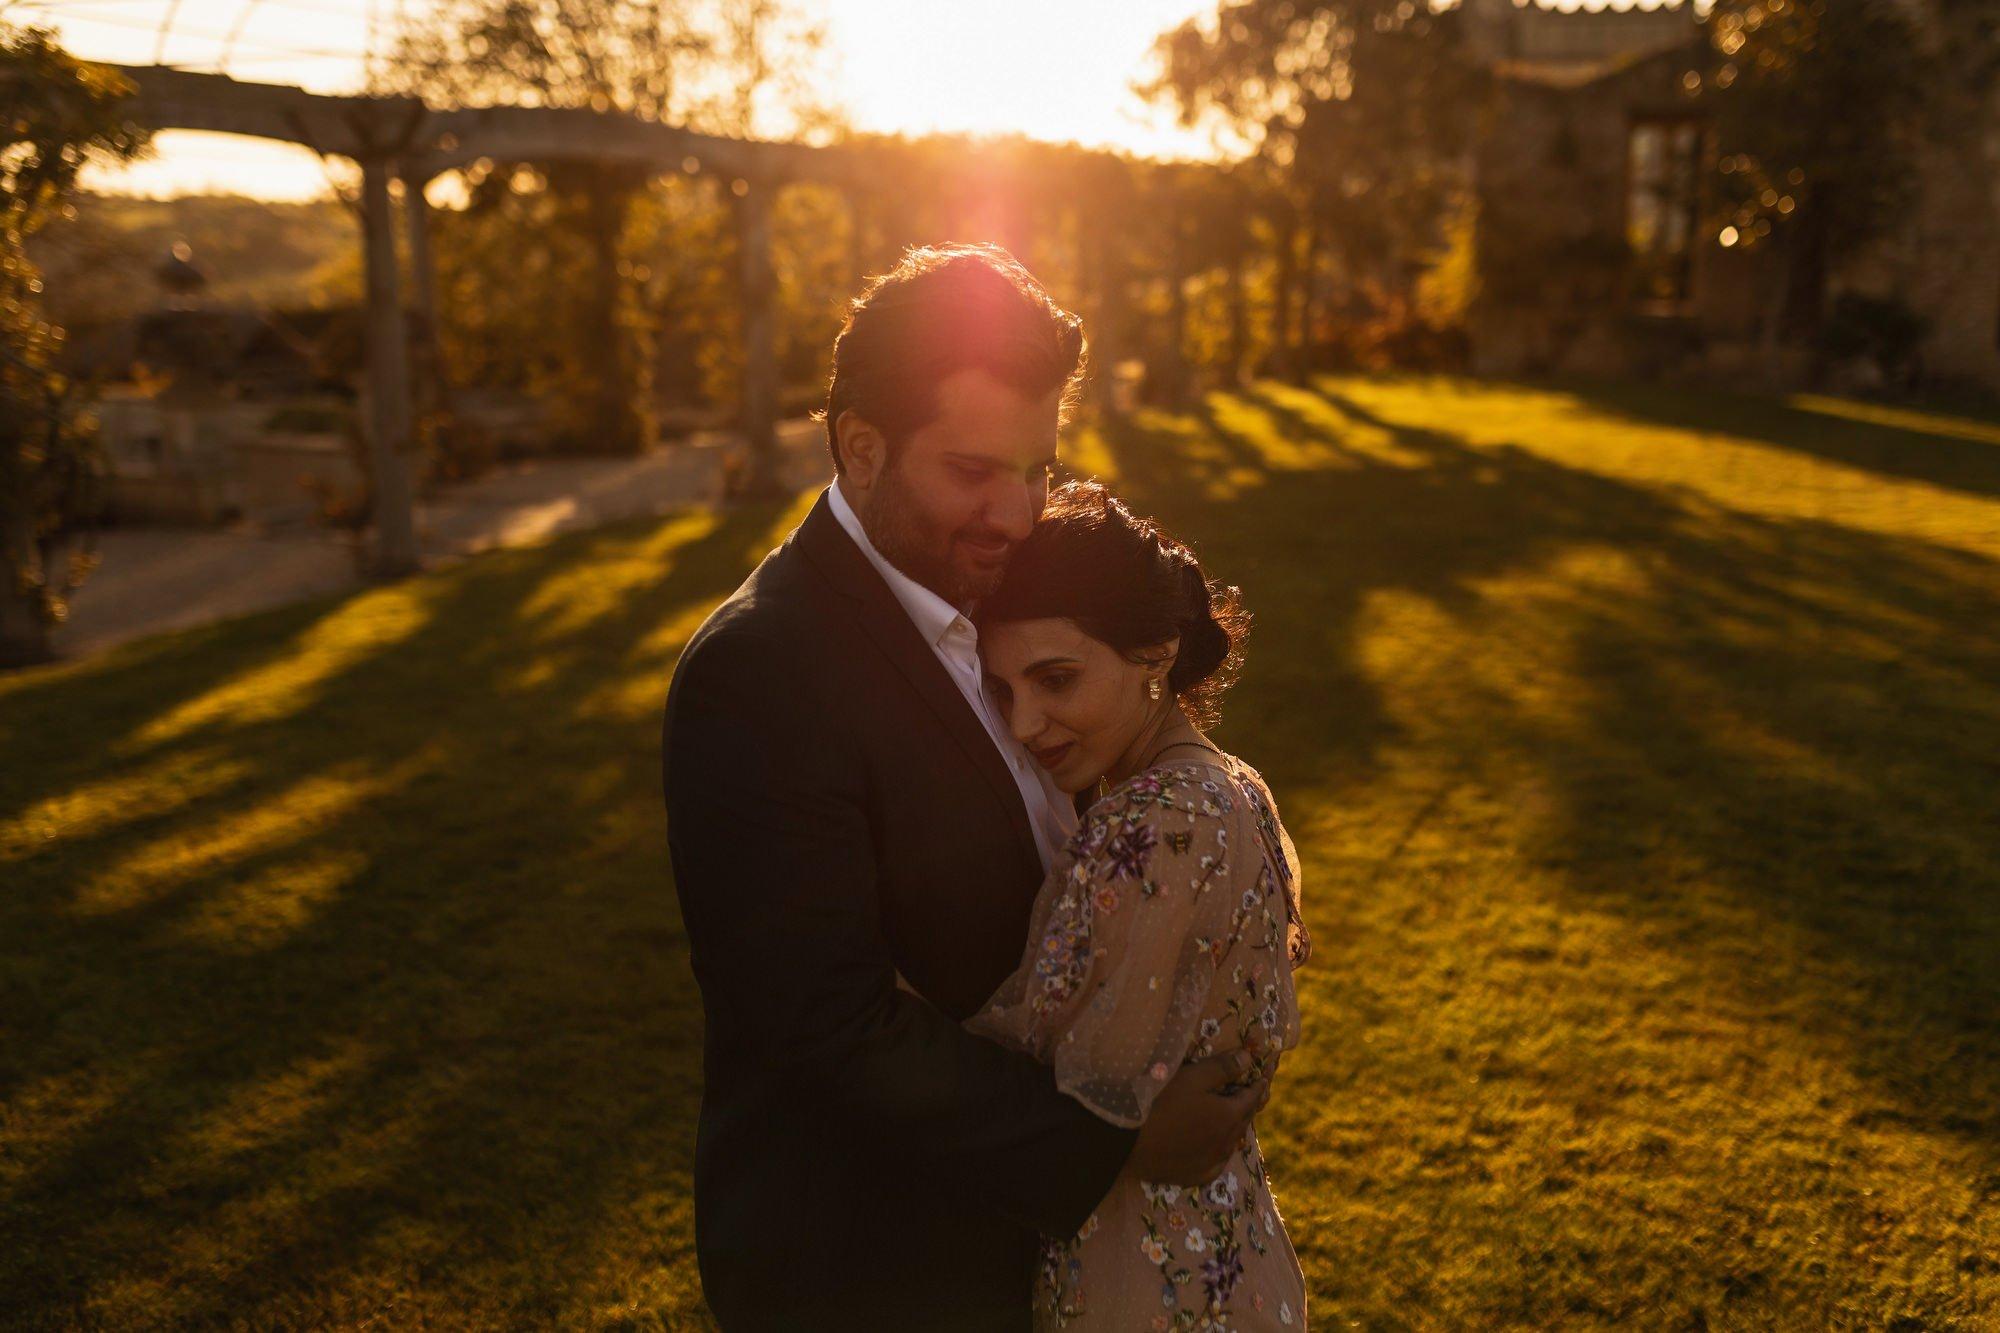 Indian wedding, couples portrait, Euridge Manor, Cotswolds, Asian wedding photographer